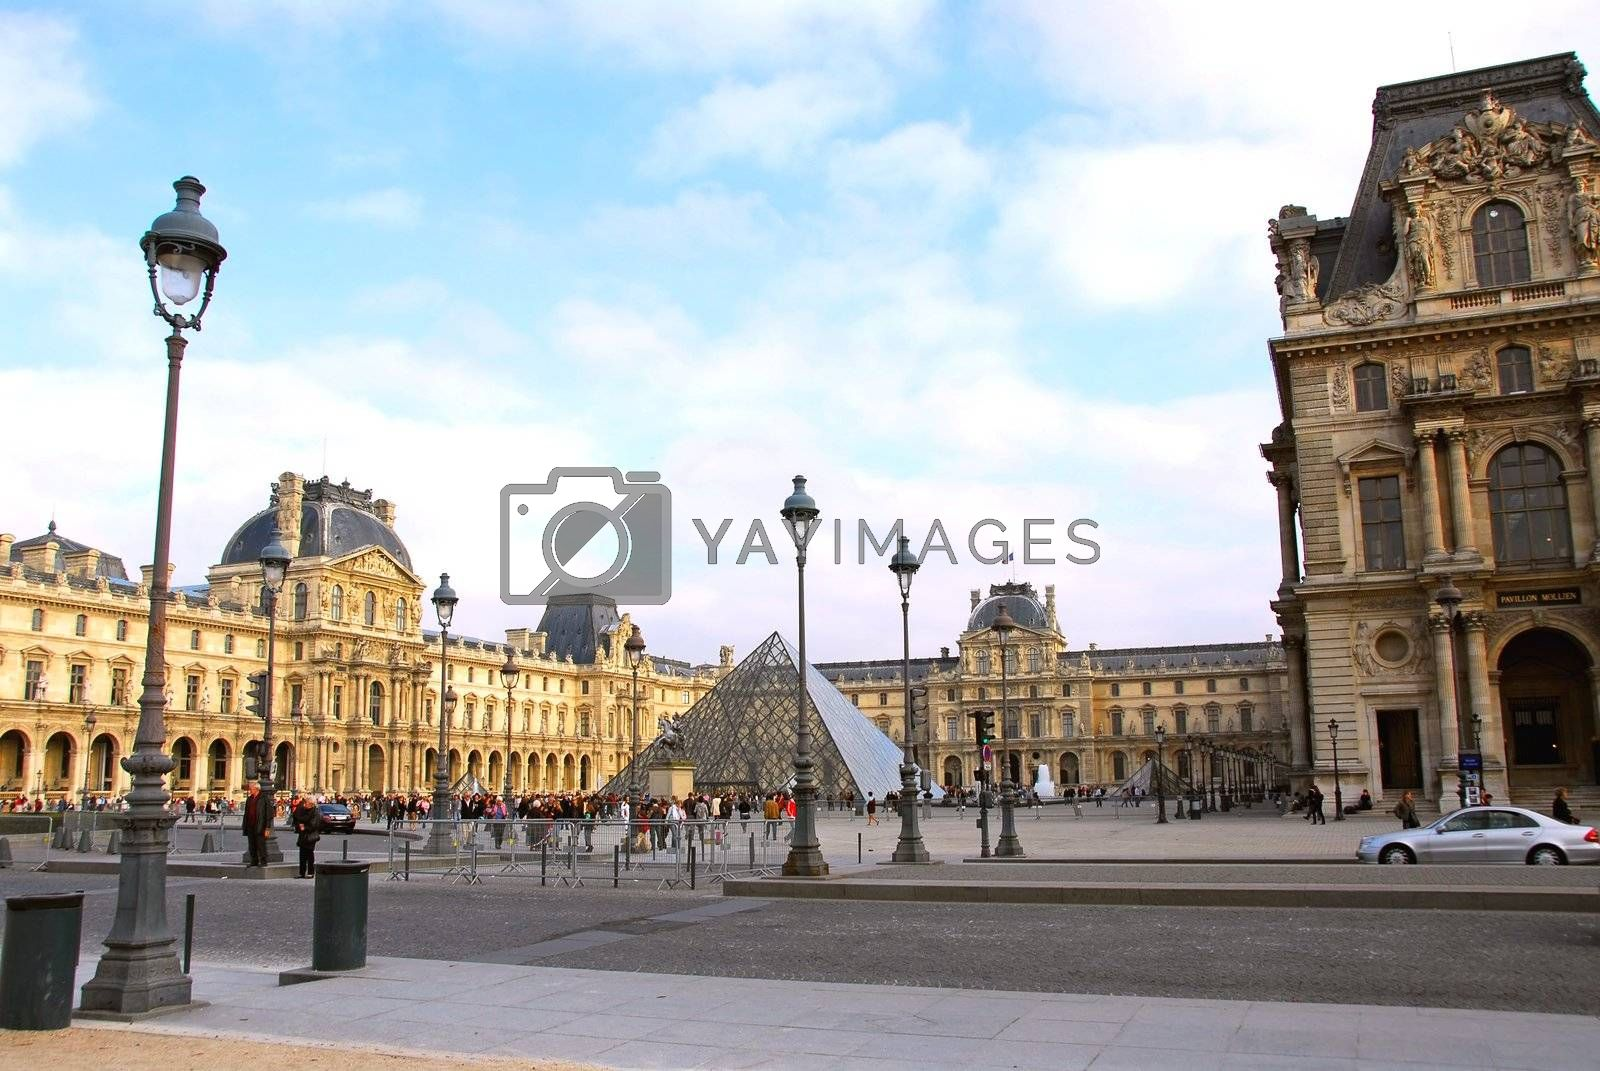 Square of Louvre building in Paris France